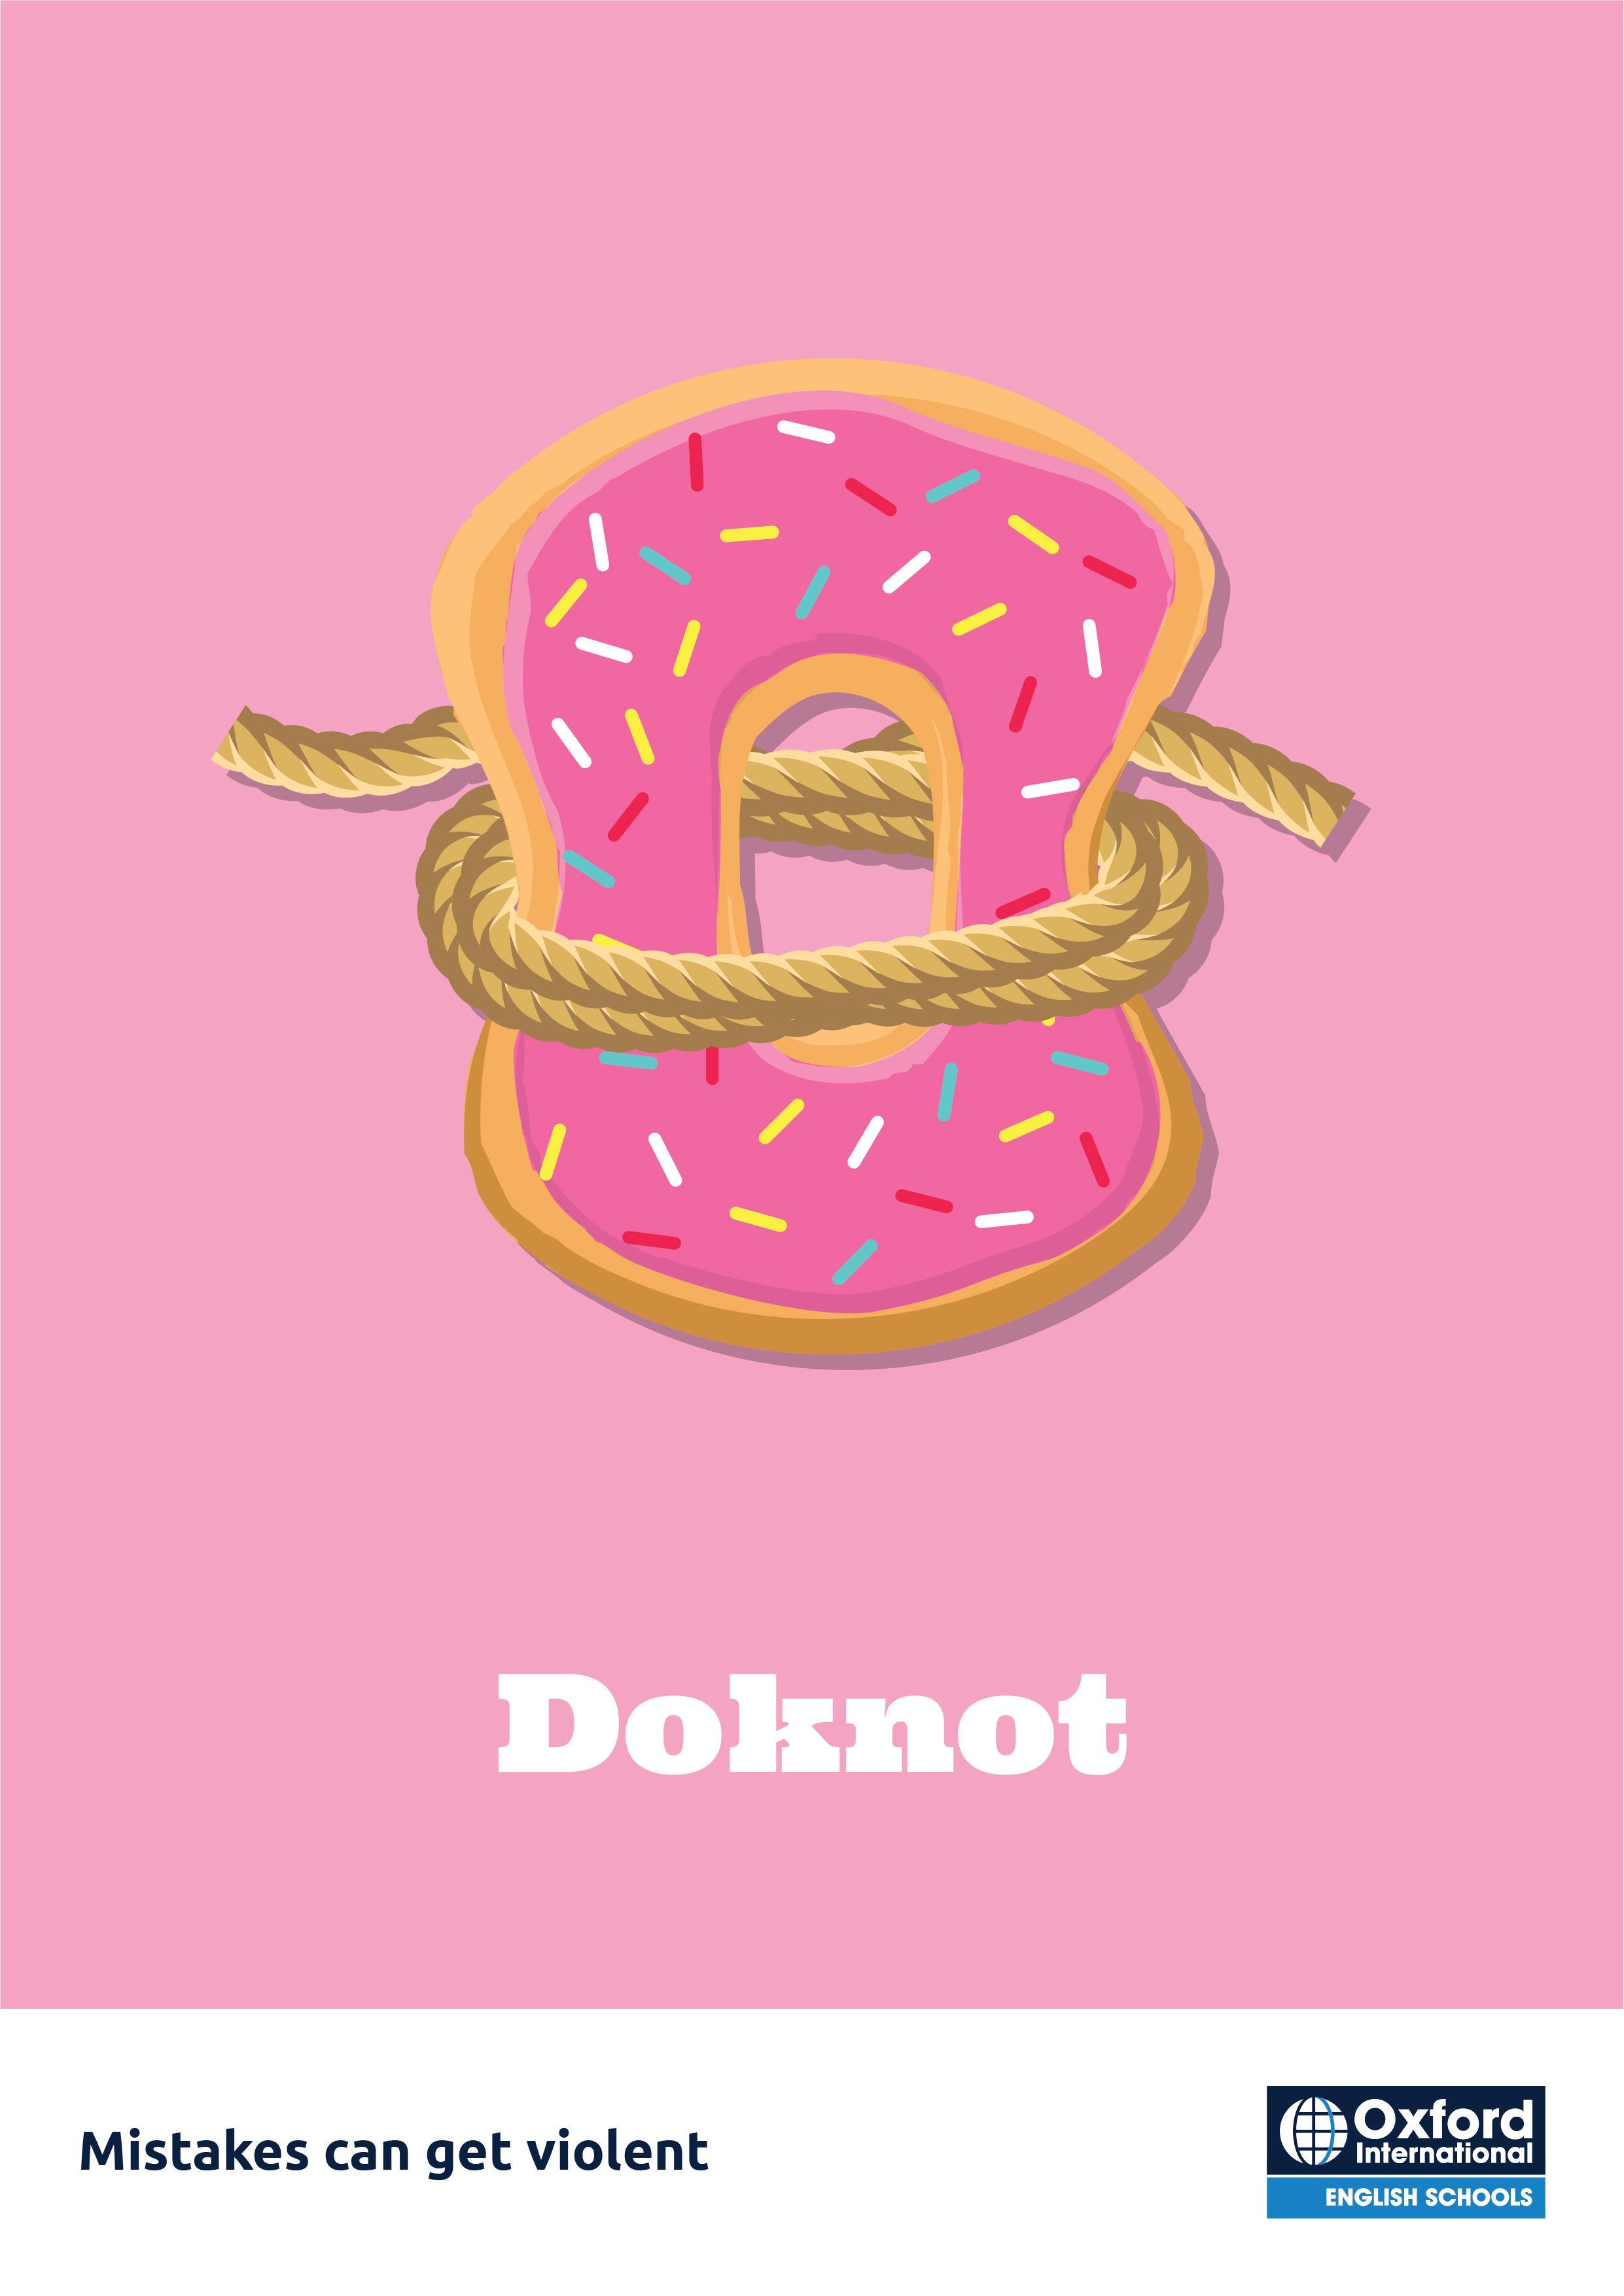 Oxford International English Schools Print Ad - Donut